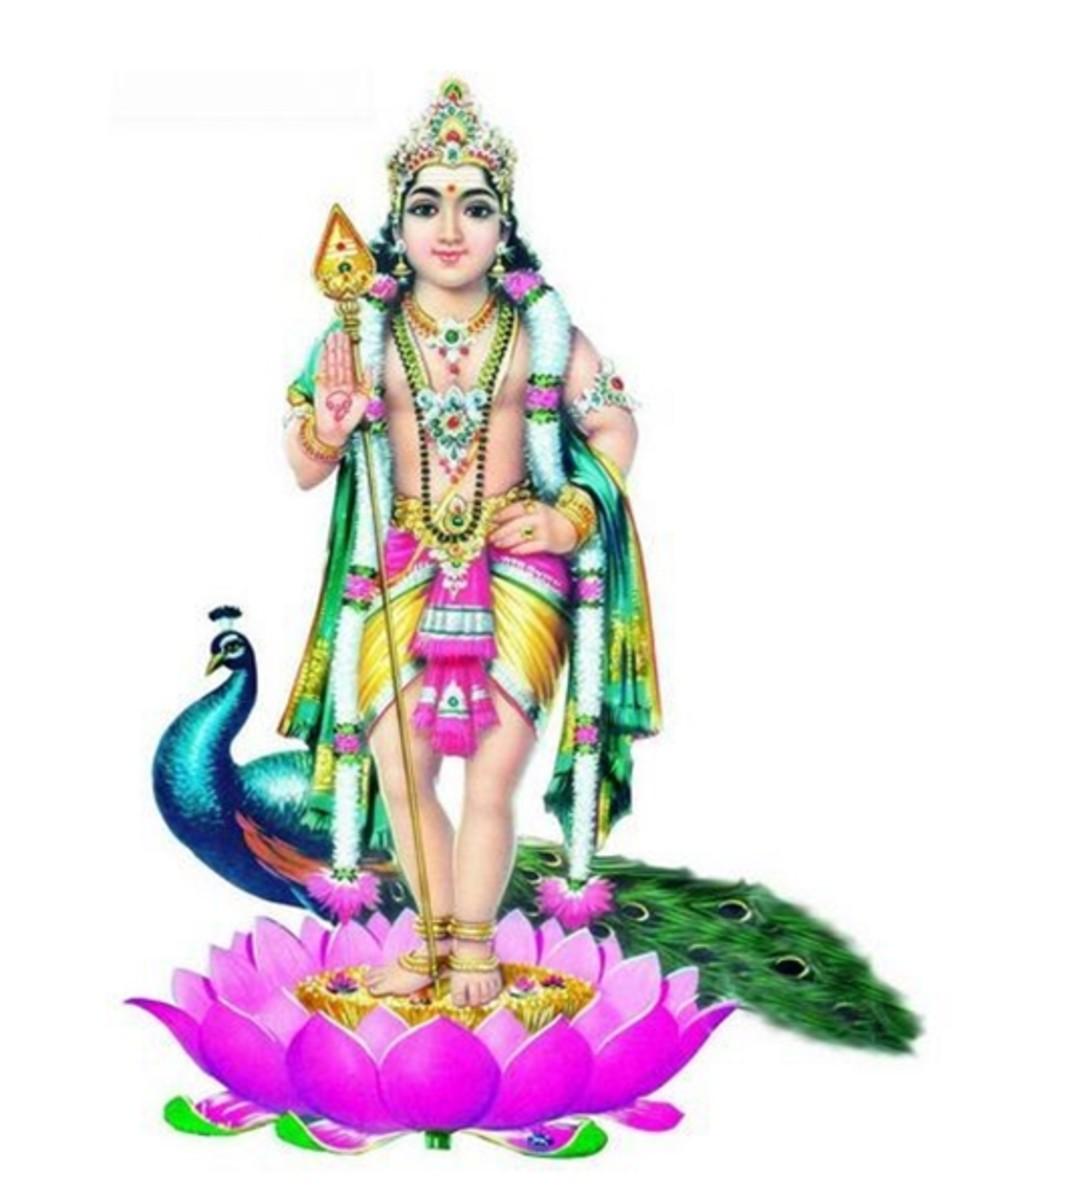 Mantras of Murugan (Lord Kartikeya)